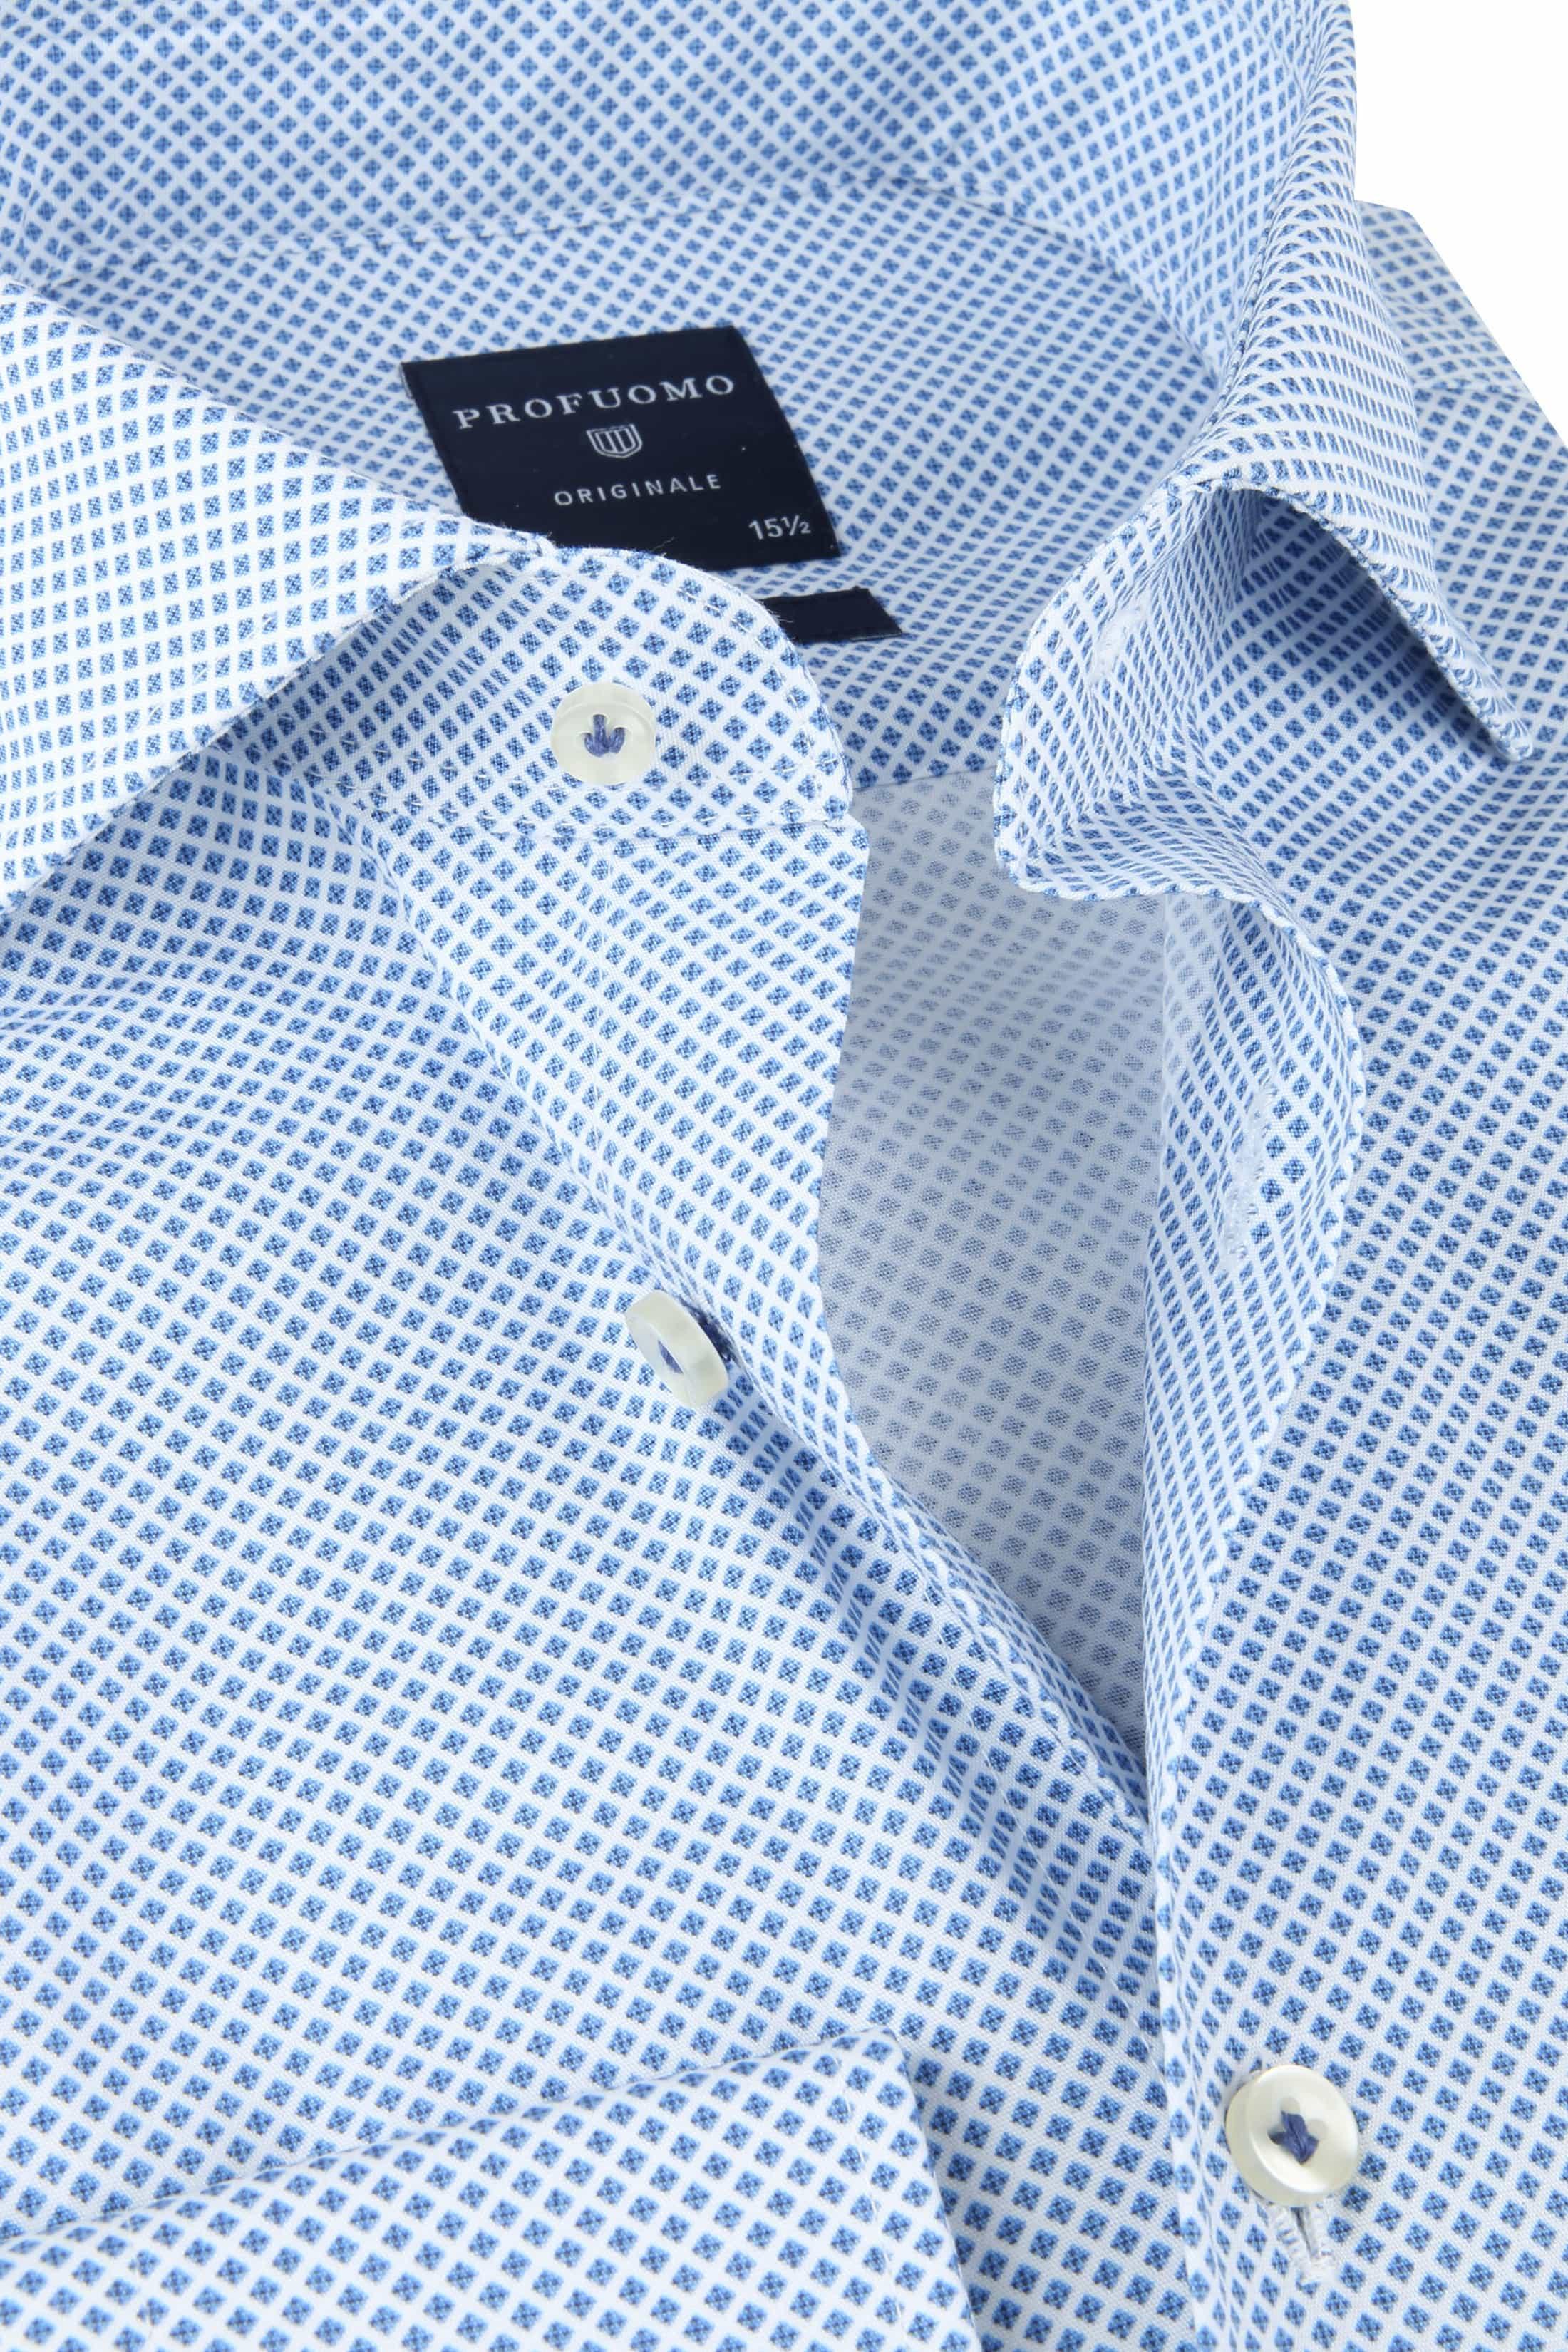 Profuomo SF Shirt Pane Blue foto 1